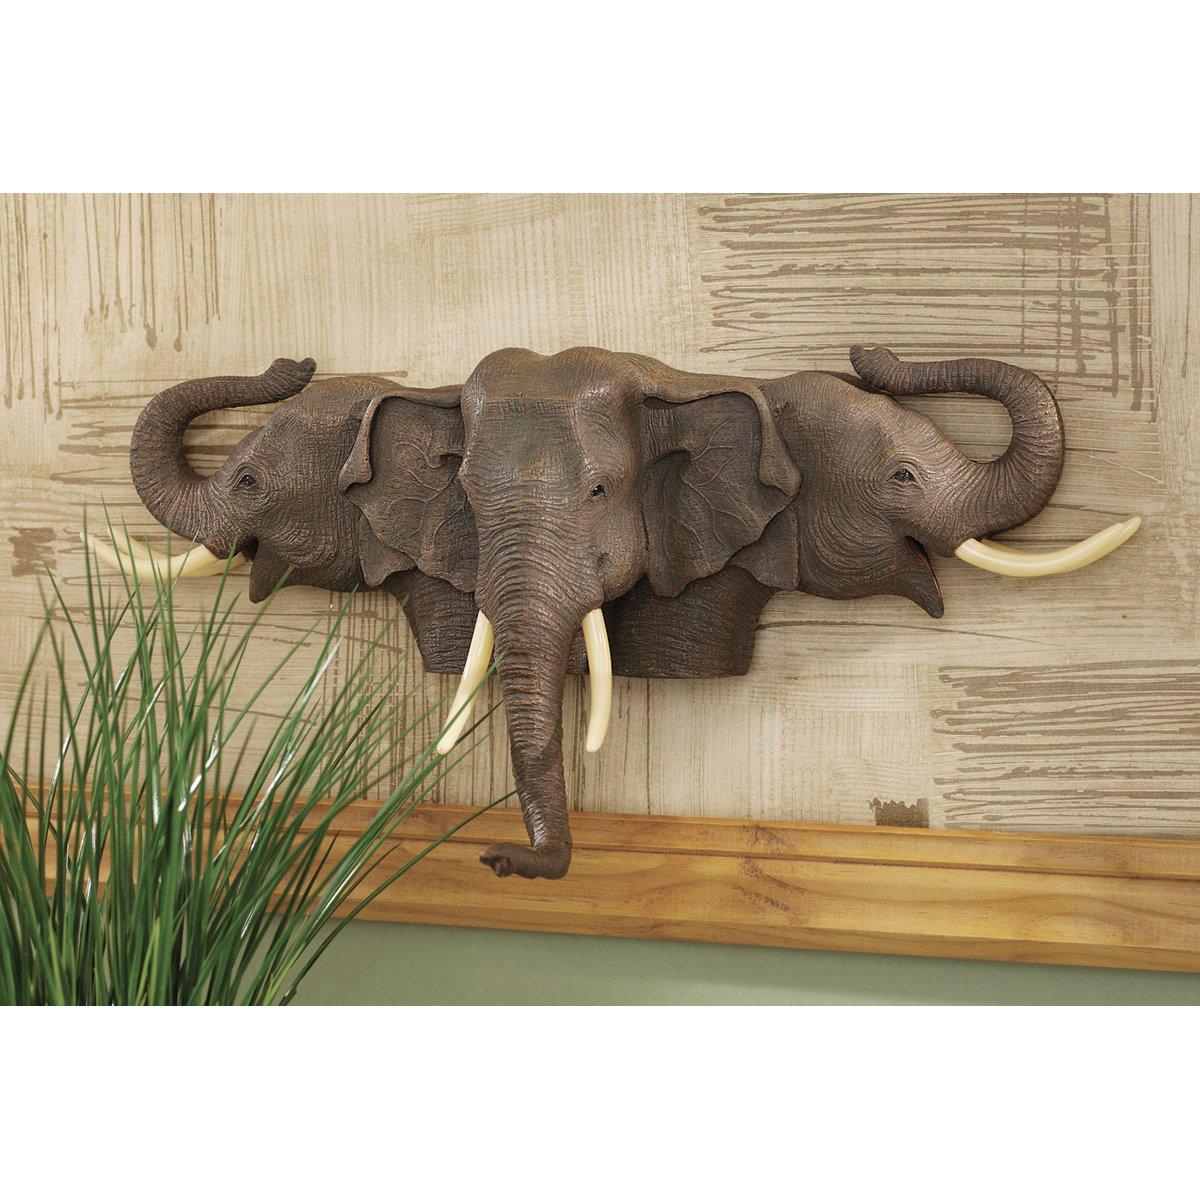 Elephant wall sculpture ornament head decor handmade